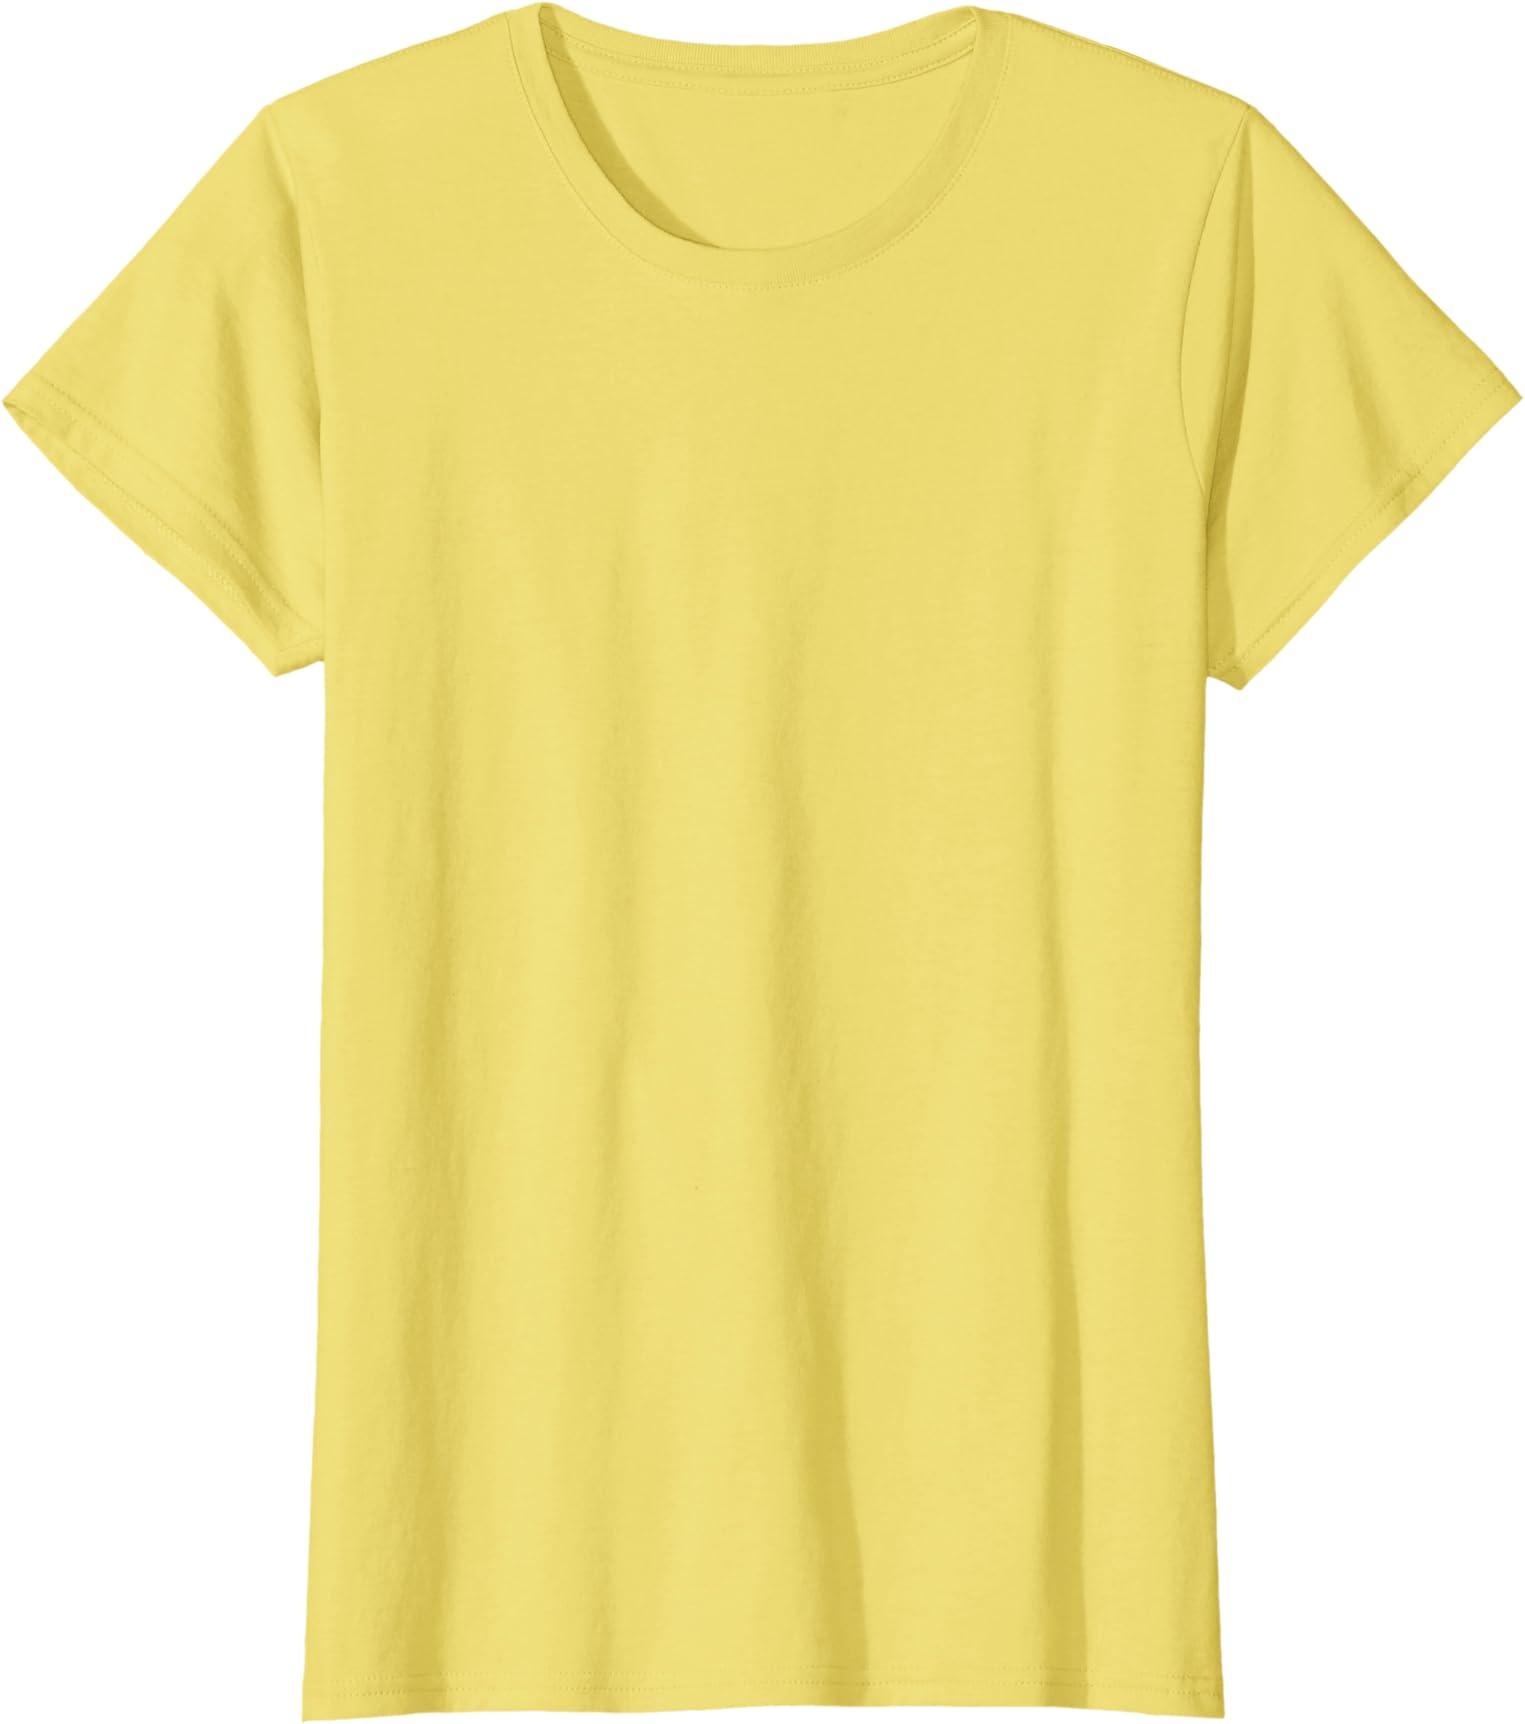 Children/'s Happy Smiley Sun T Shirt Boys or girls Summer Sunshine tee